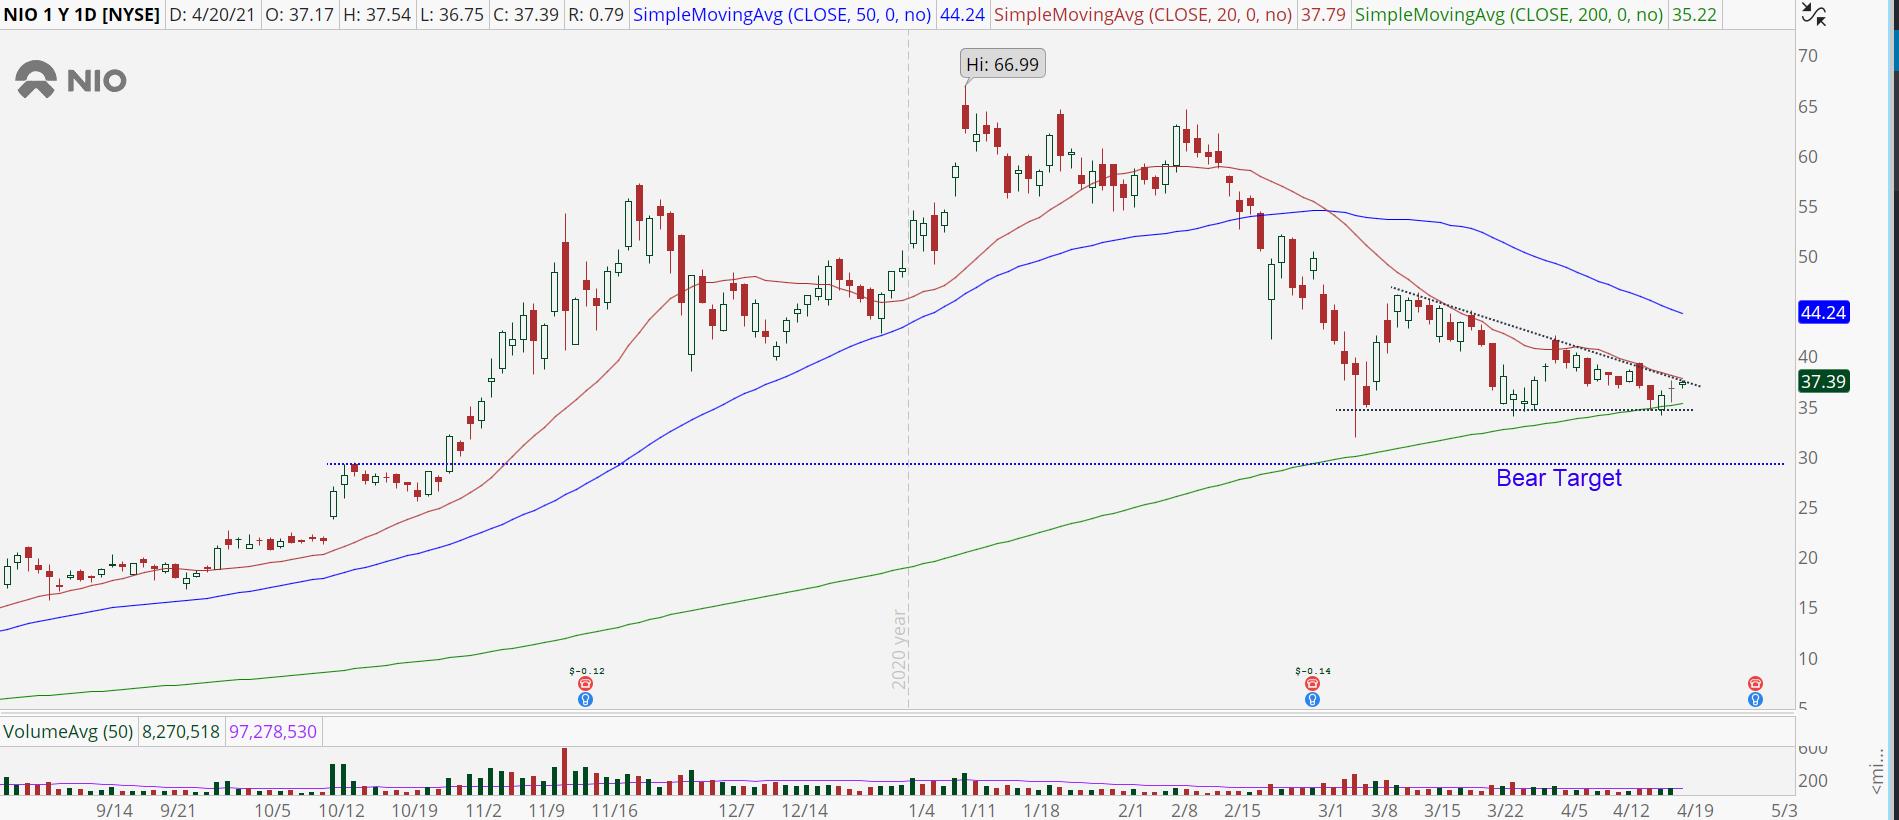 Nio (NIO) daily stock chart with descending triangle